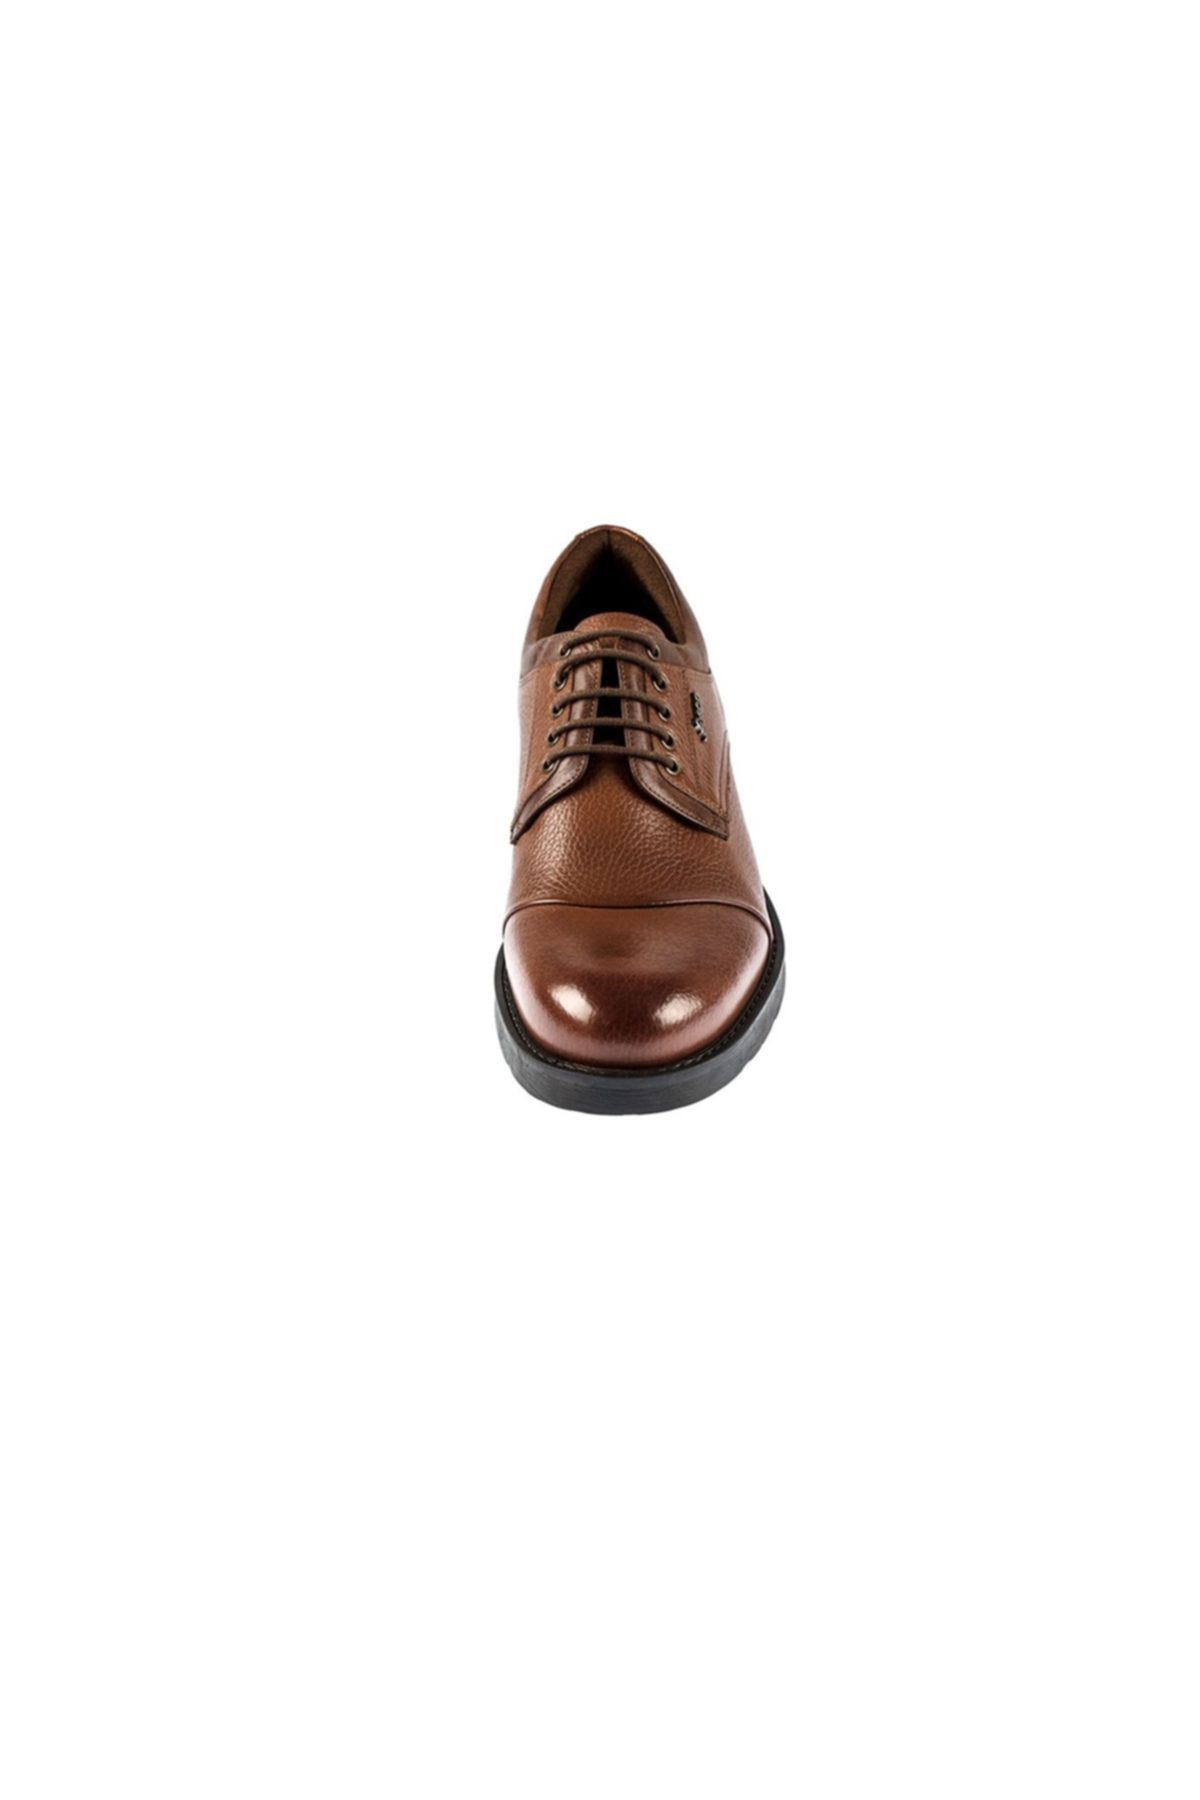 Tan couro genuíno sola de borracha forro quente inverno sapatos masculinos 7520 771 603